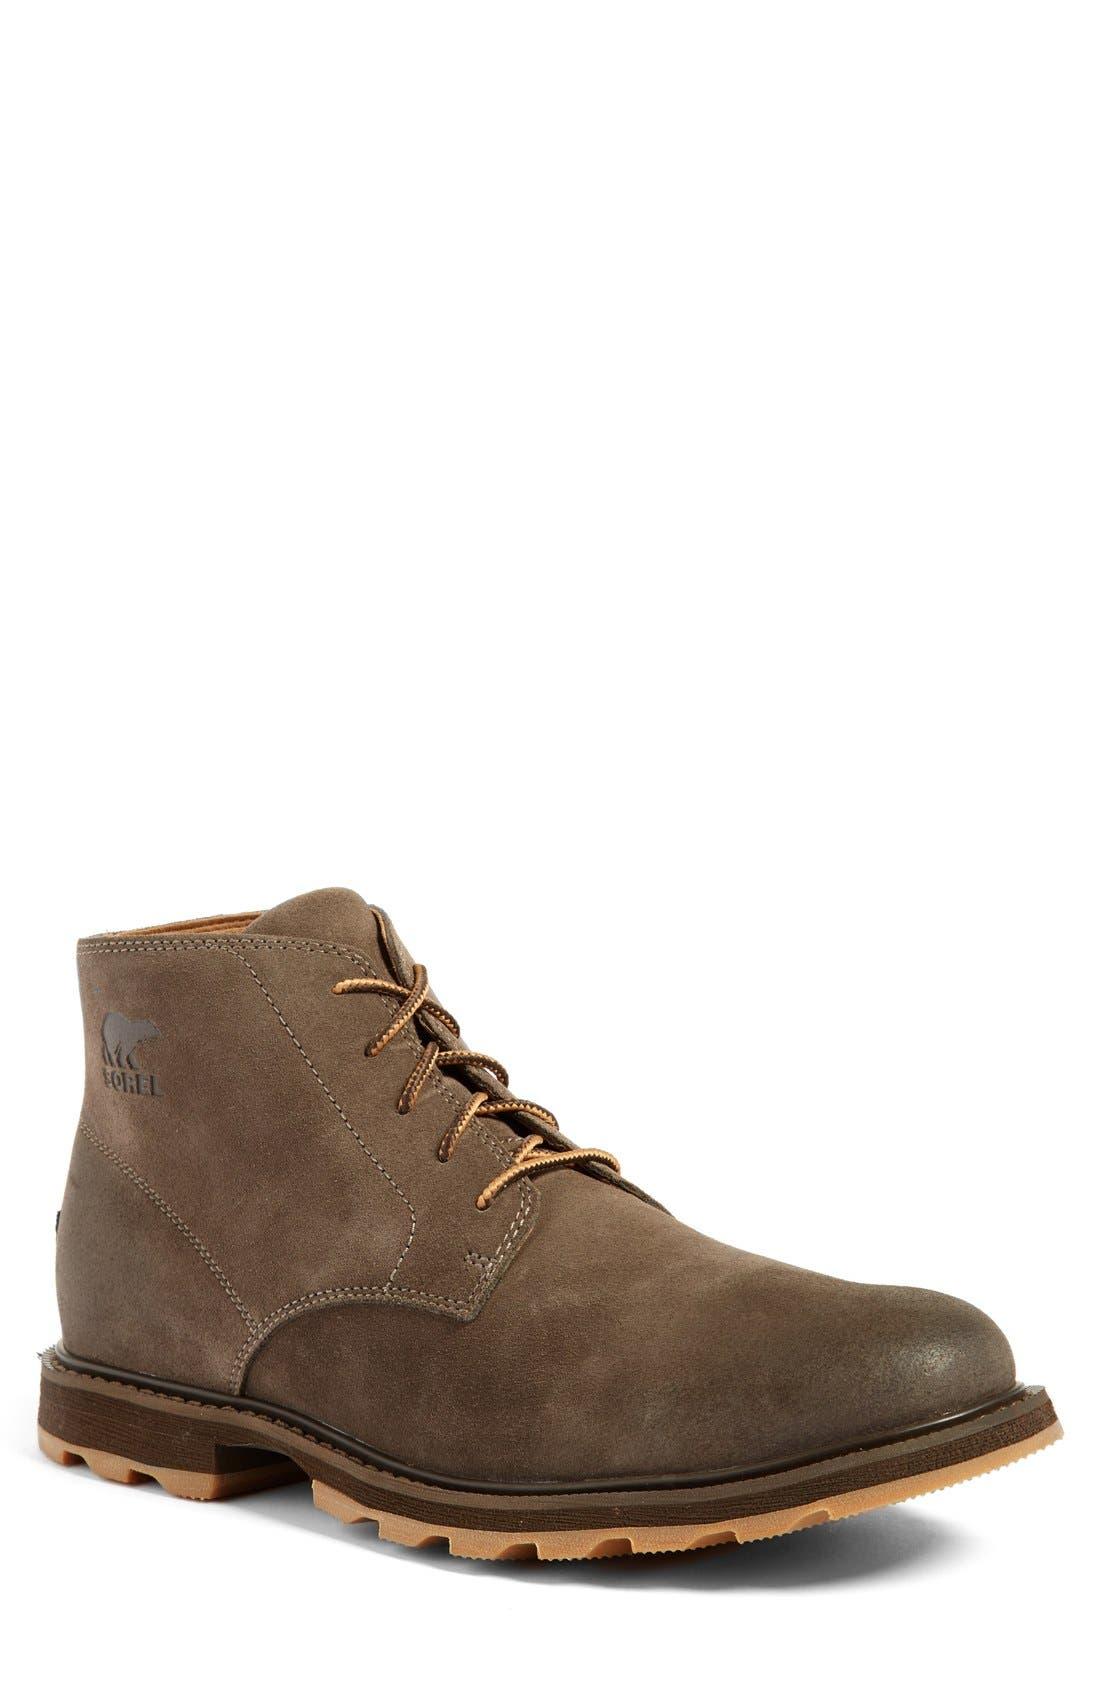 Alternate Image 1 Selected - Sorel 'Madson' Chukka Boot (Men)